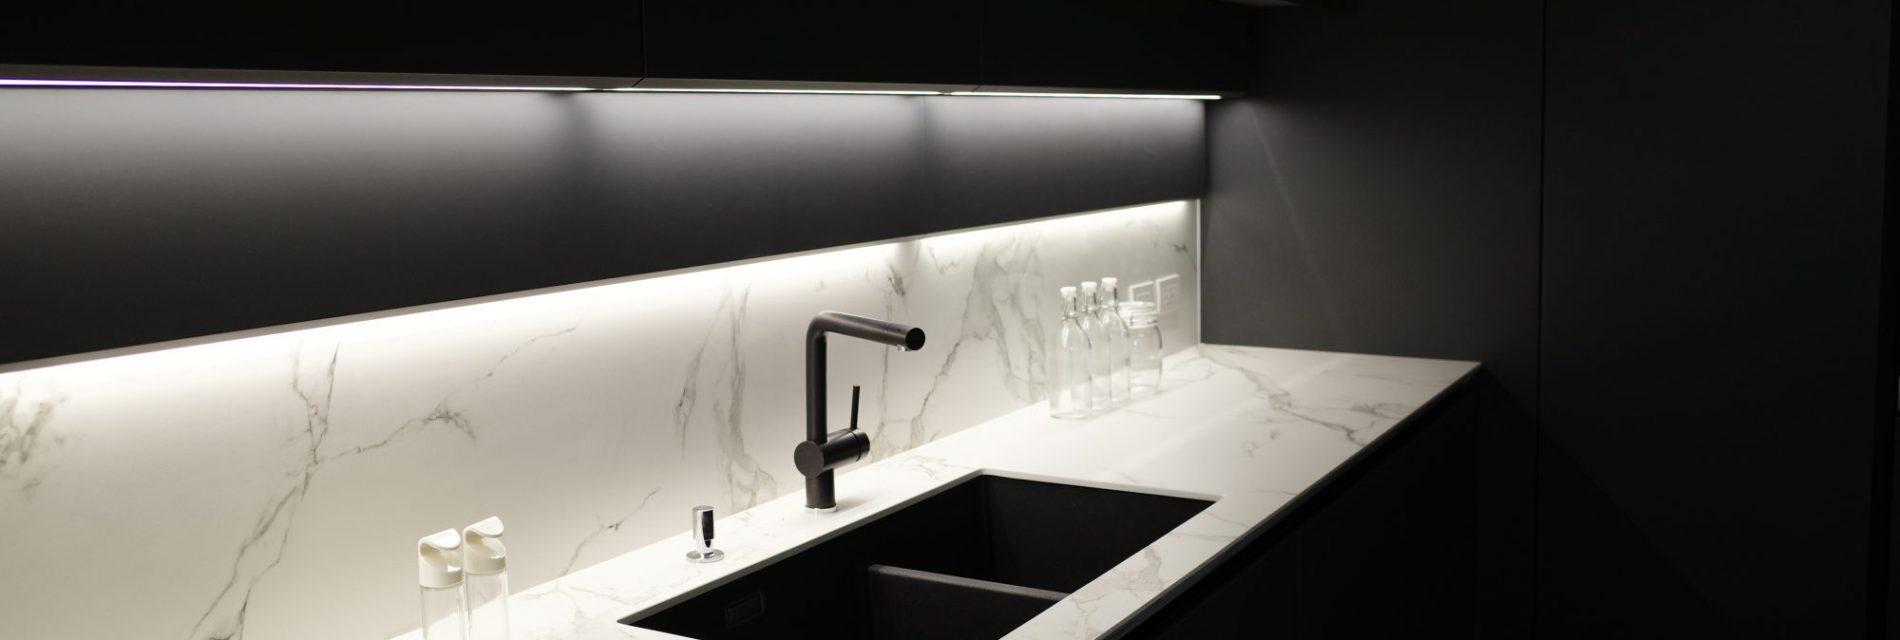 Mobilier en marbre